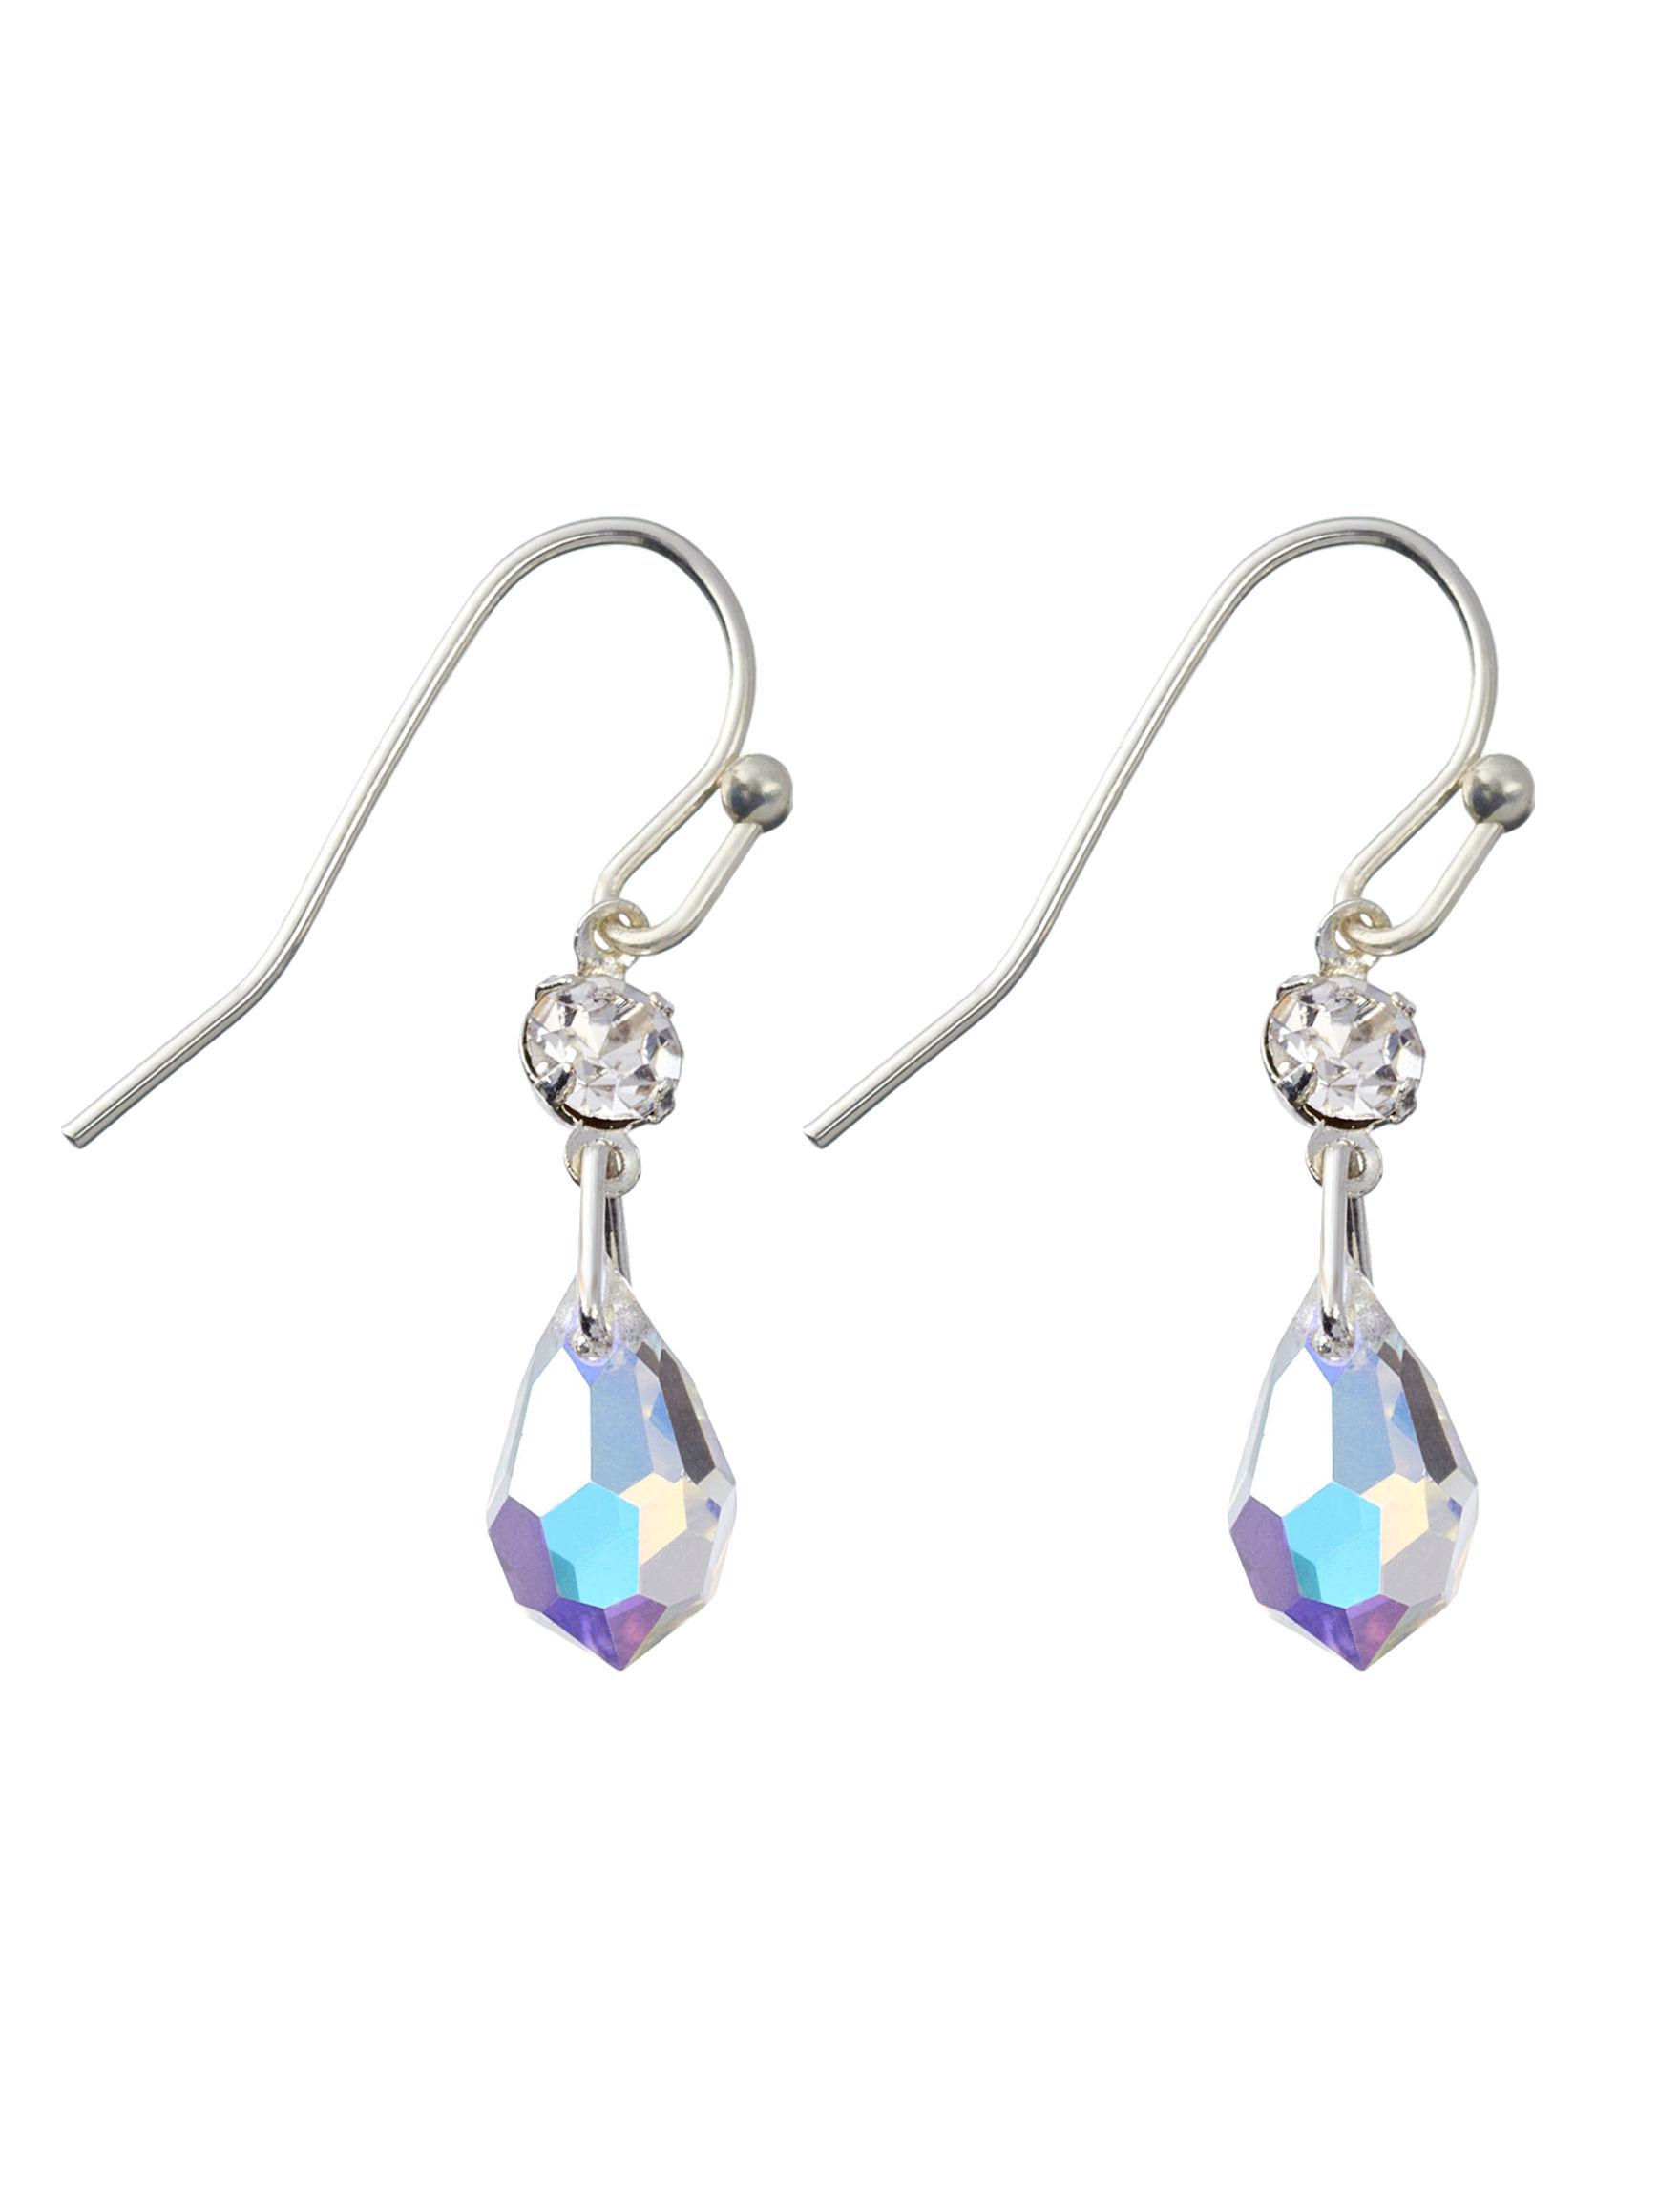 Via Roma Silver / Crystal Drops Earrings Fashion Jewelry